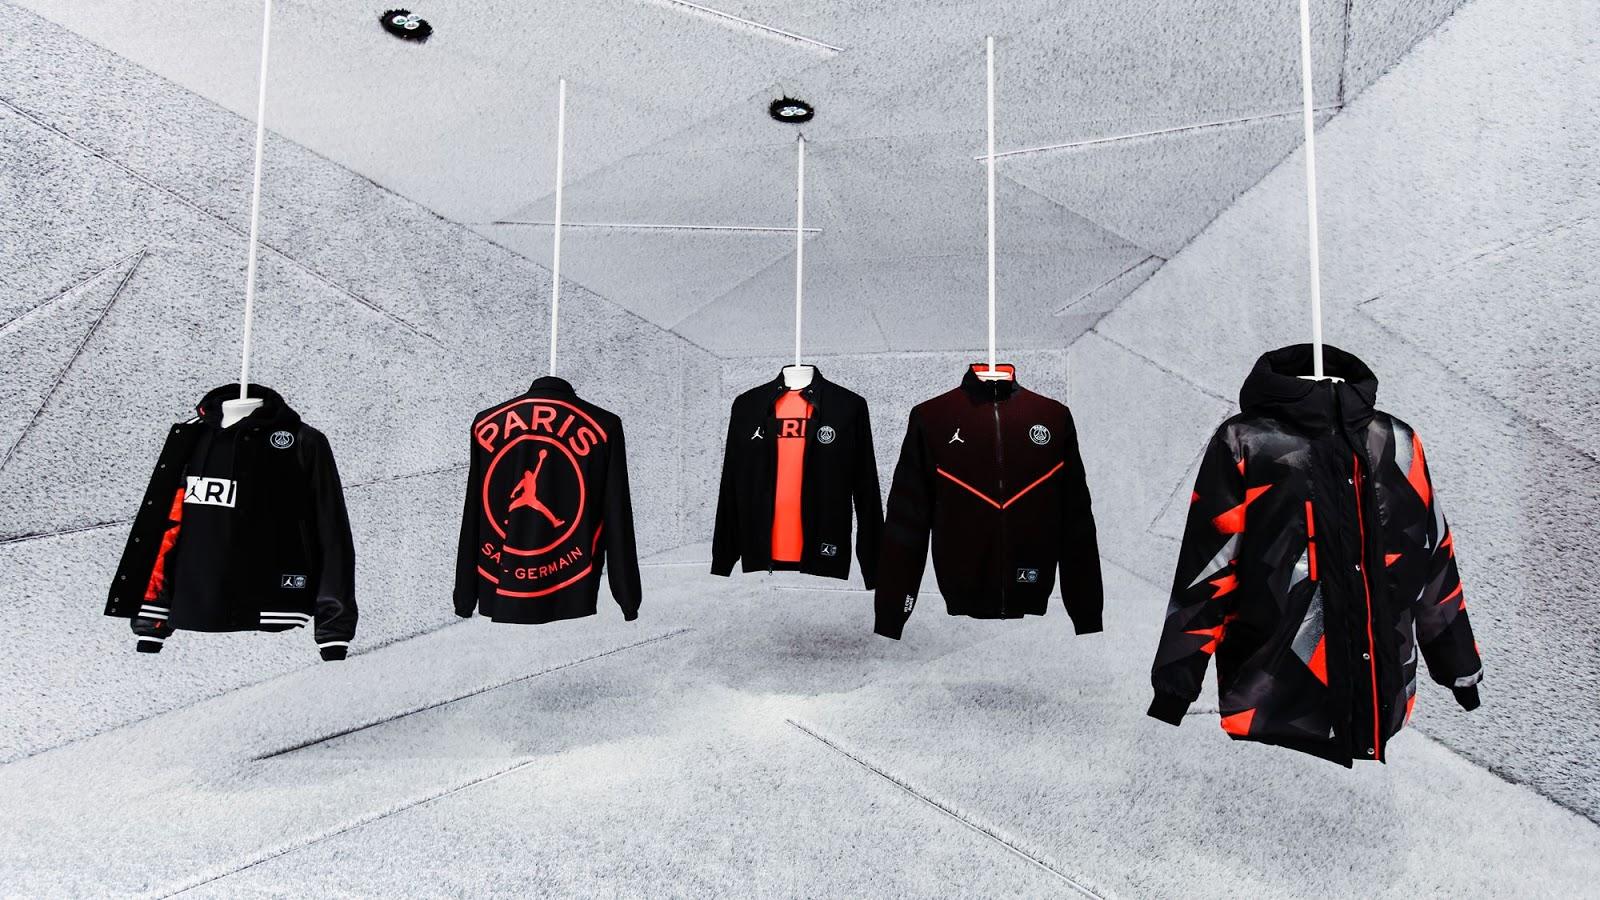 Resistencia Melancólico difícil  Kit Coming Very Soon   Jordan x PSG 19-20 Clothing & Footwear Collection  Released - Footy Headlines